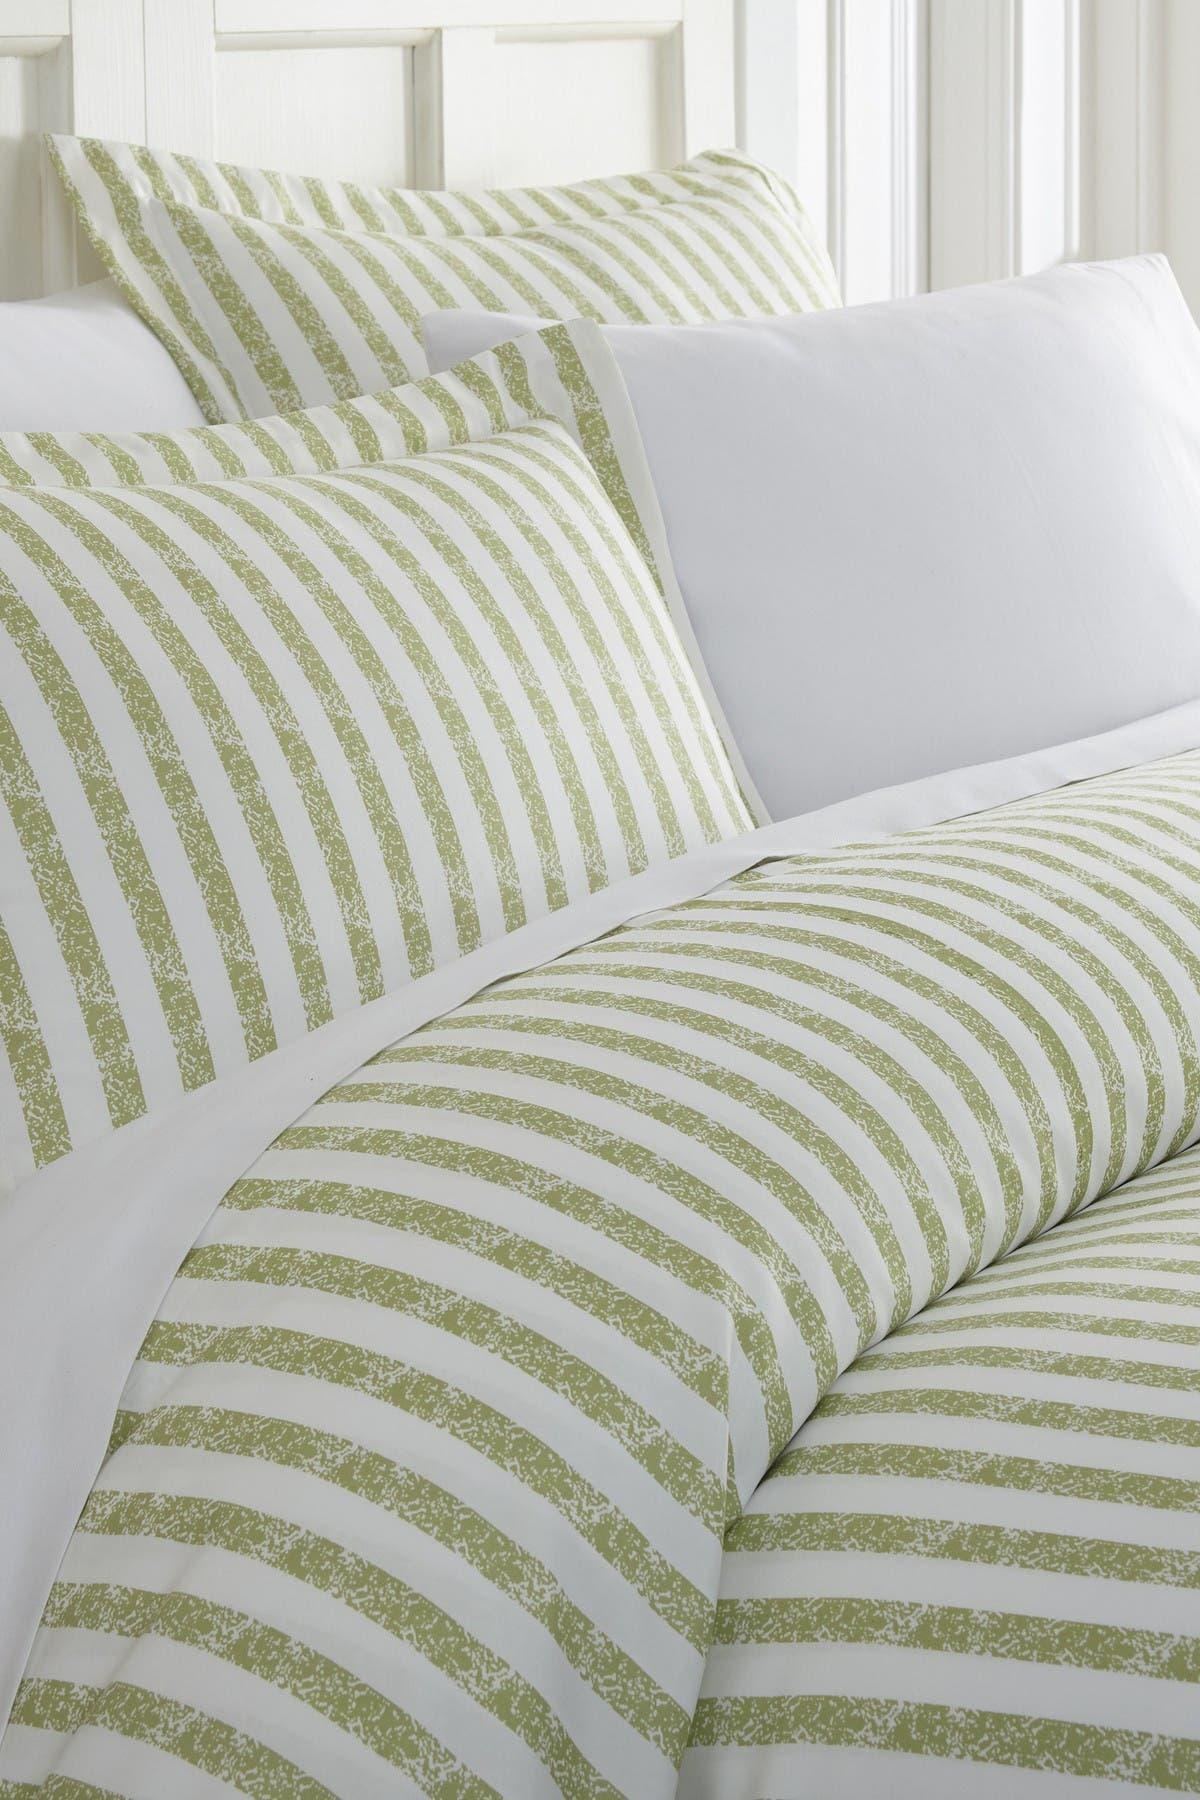 Image of IENJOY HOME Home Spun Premium Ultra Soft 2-Piece Puffed Rugged Stripes Duvet Cover Twin Set - Sage